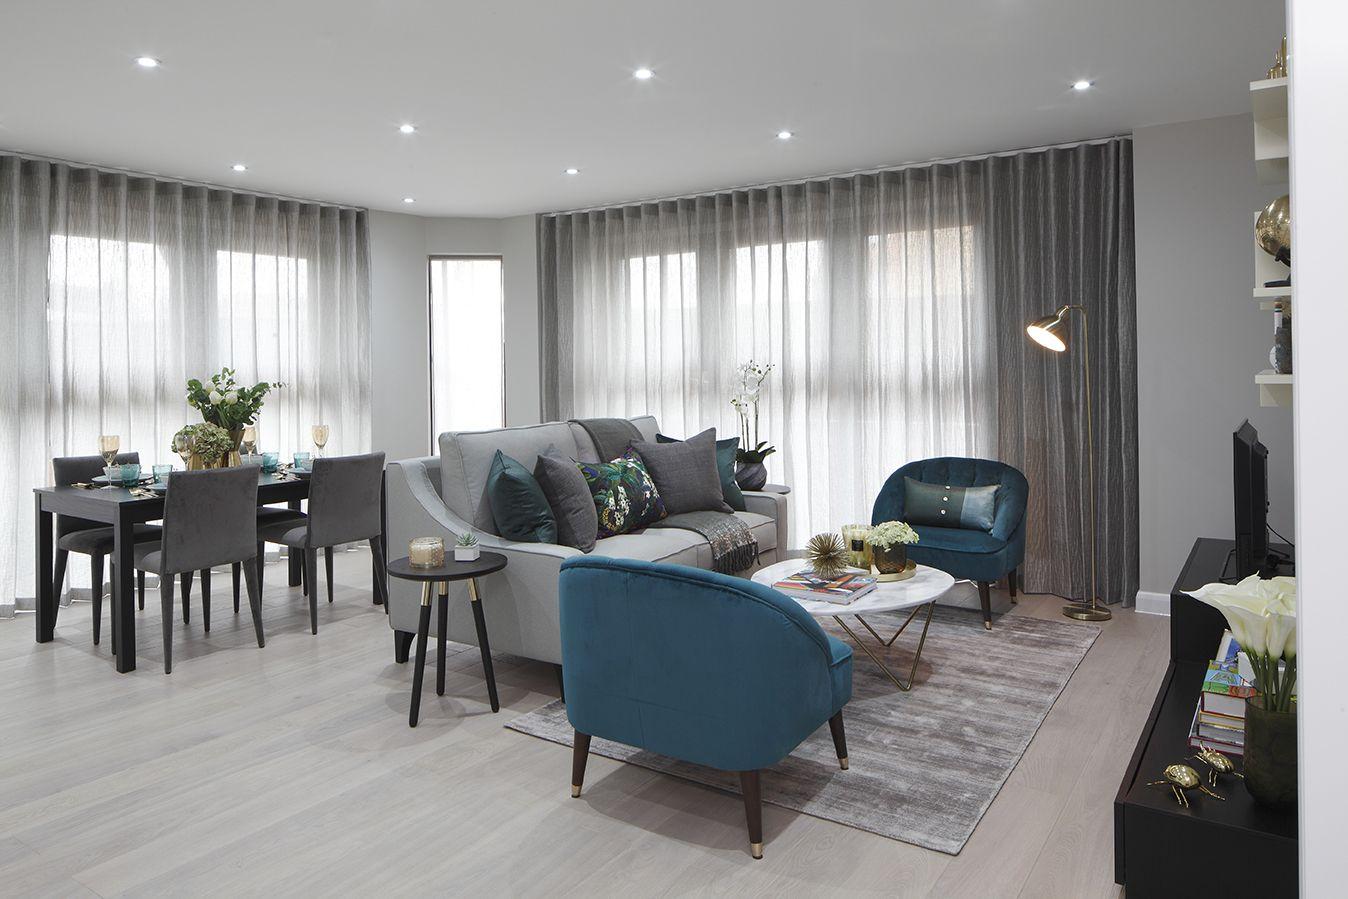 Open Plan Living Grey Oak Floor Sheer Wave Curtains Teal Armchairs Grey Curtains Living Room Gray Oak Floor Living Room Designs #teal #drapes #for #living #room